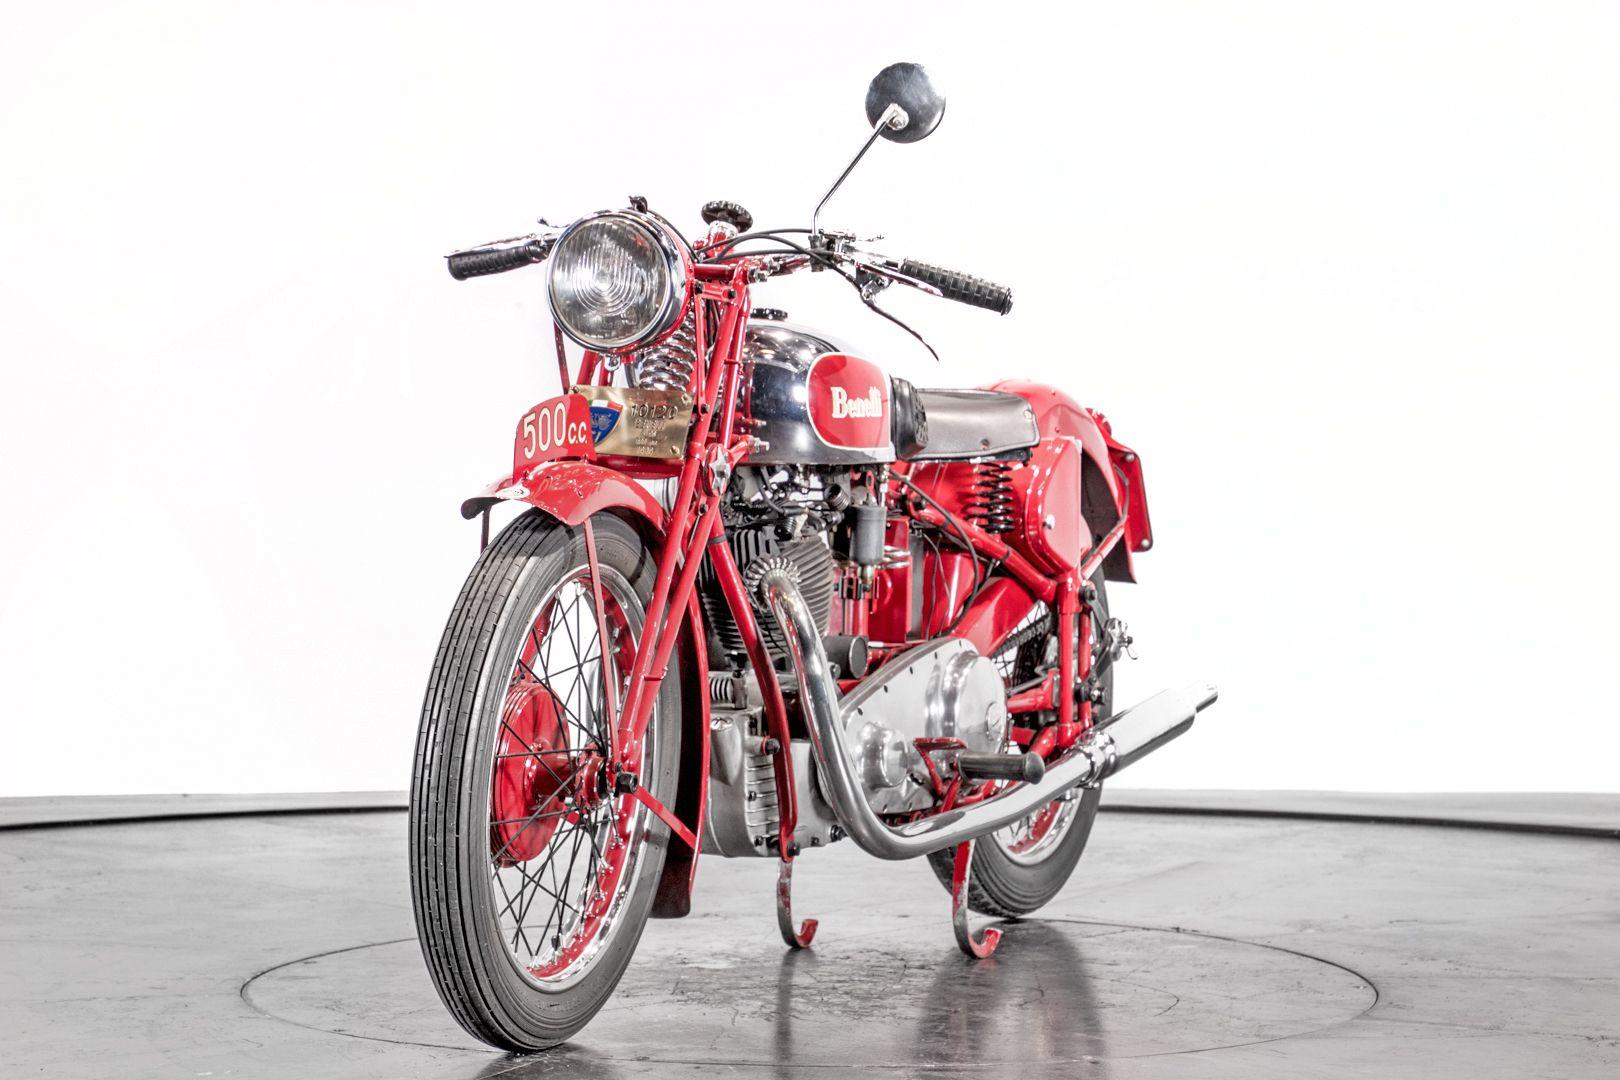 1939 Benelli 500 4TS 74468